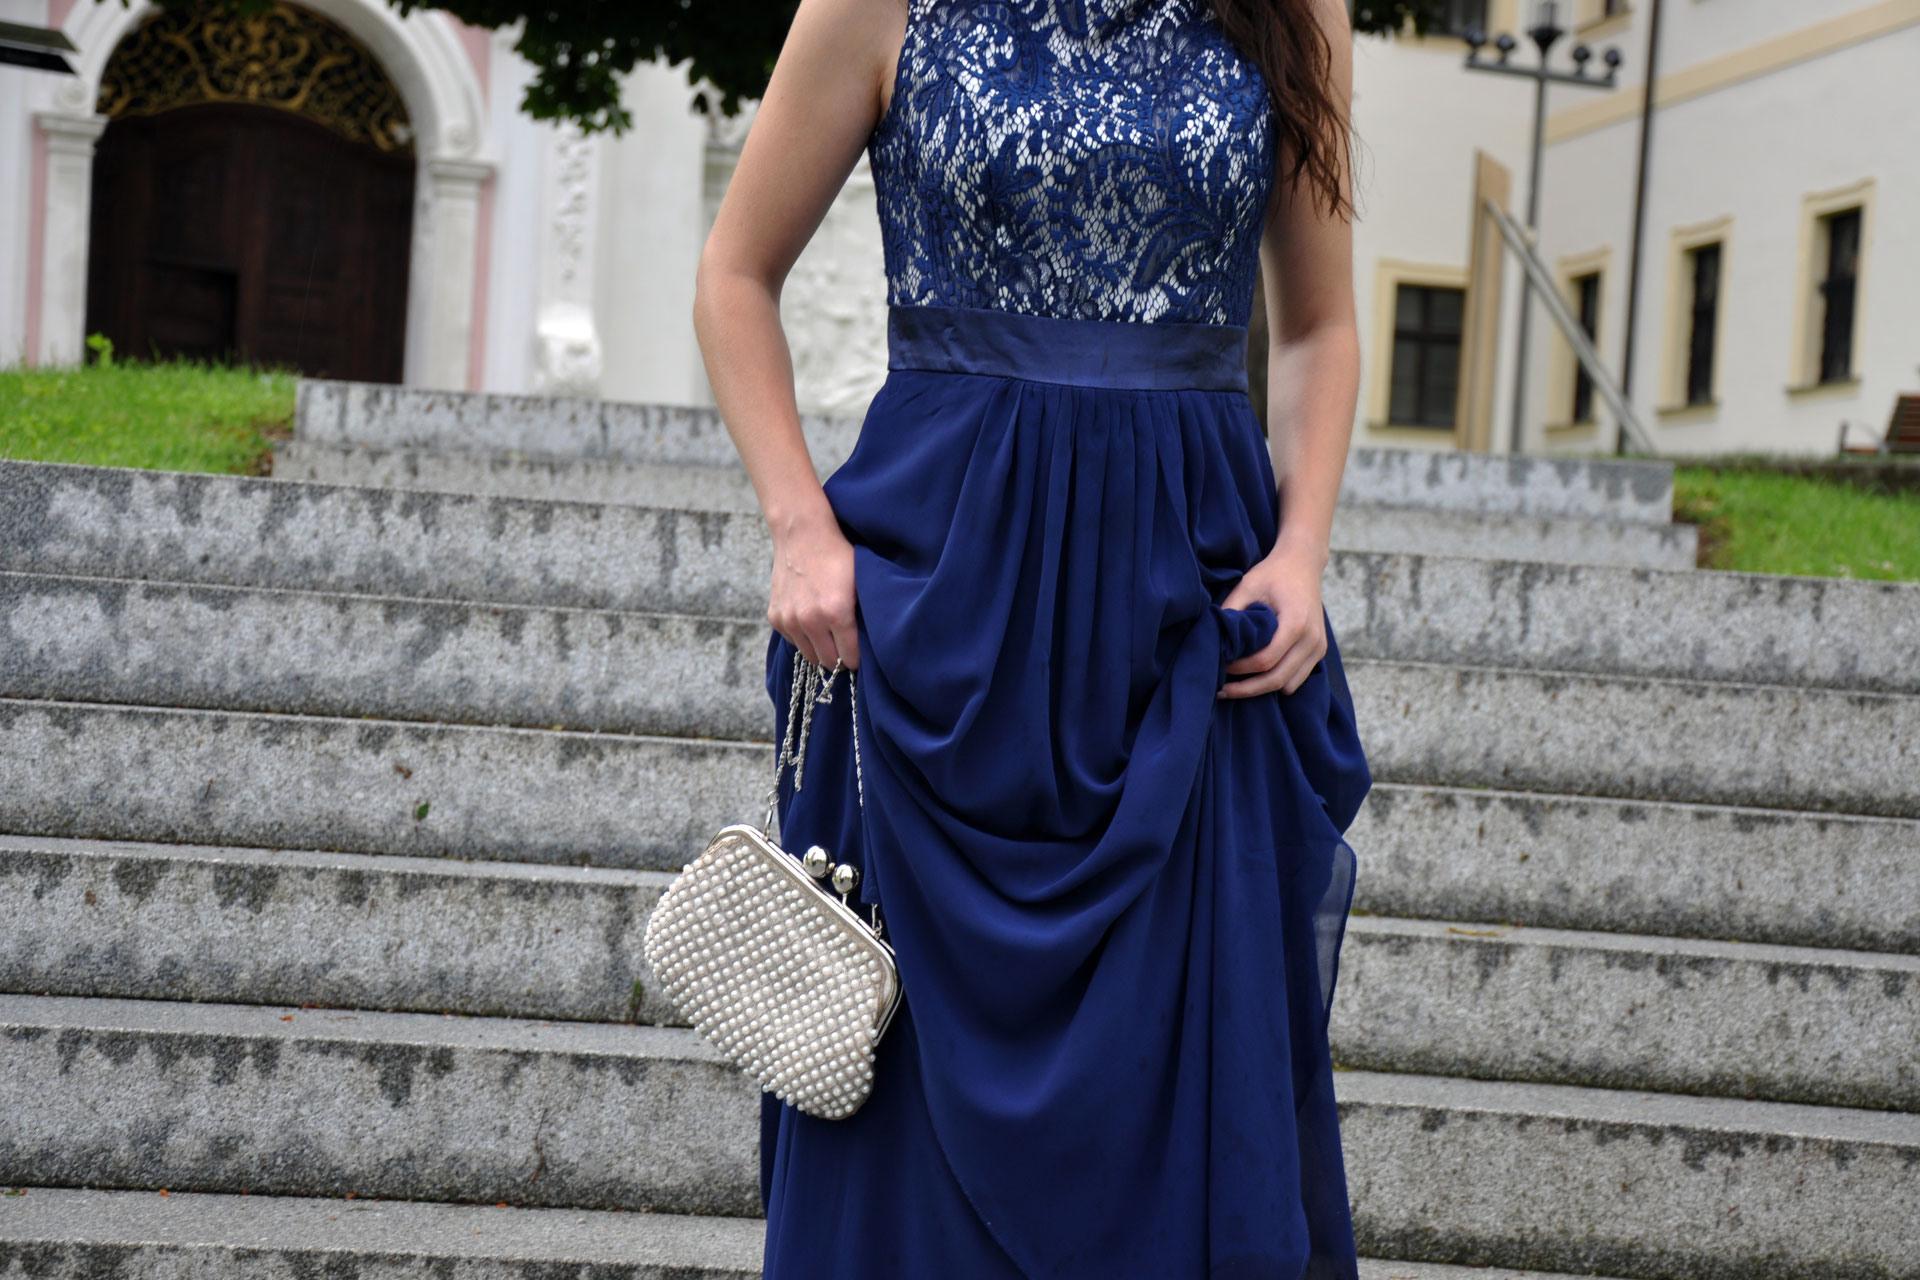 17 Spektakulär Abendkleider Passau Spezialgebiet13 Top Abendkleider Passau Vertrieb